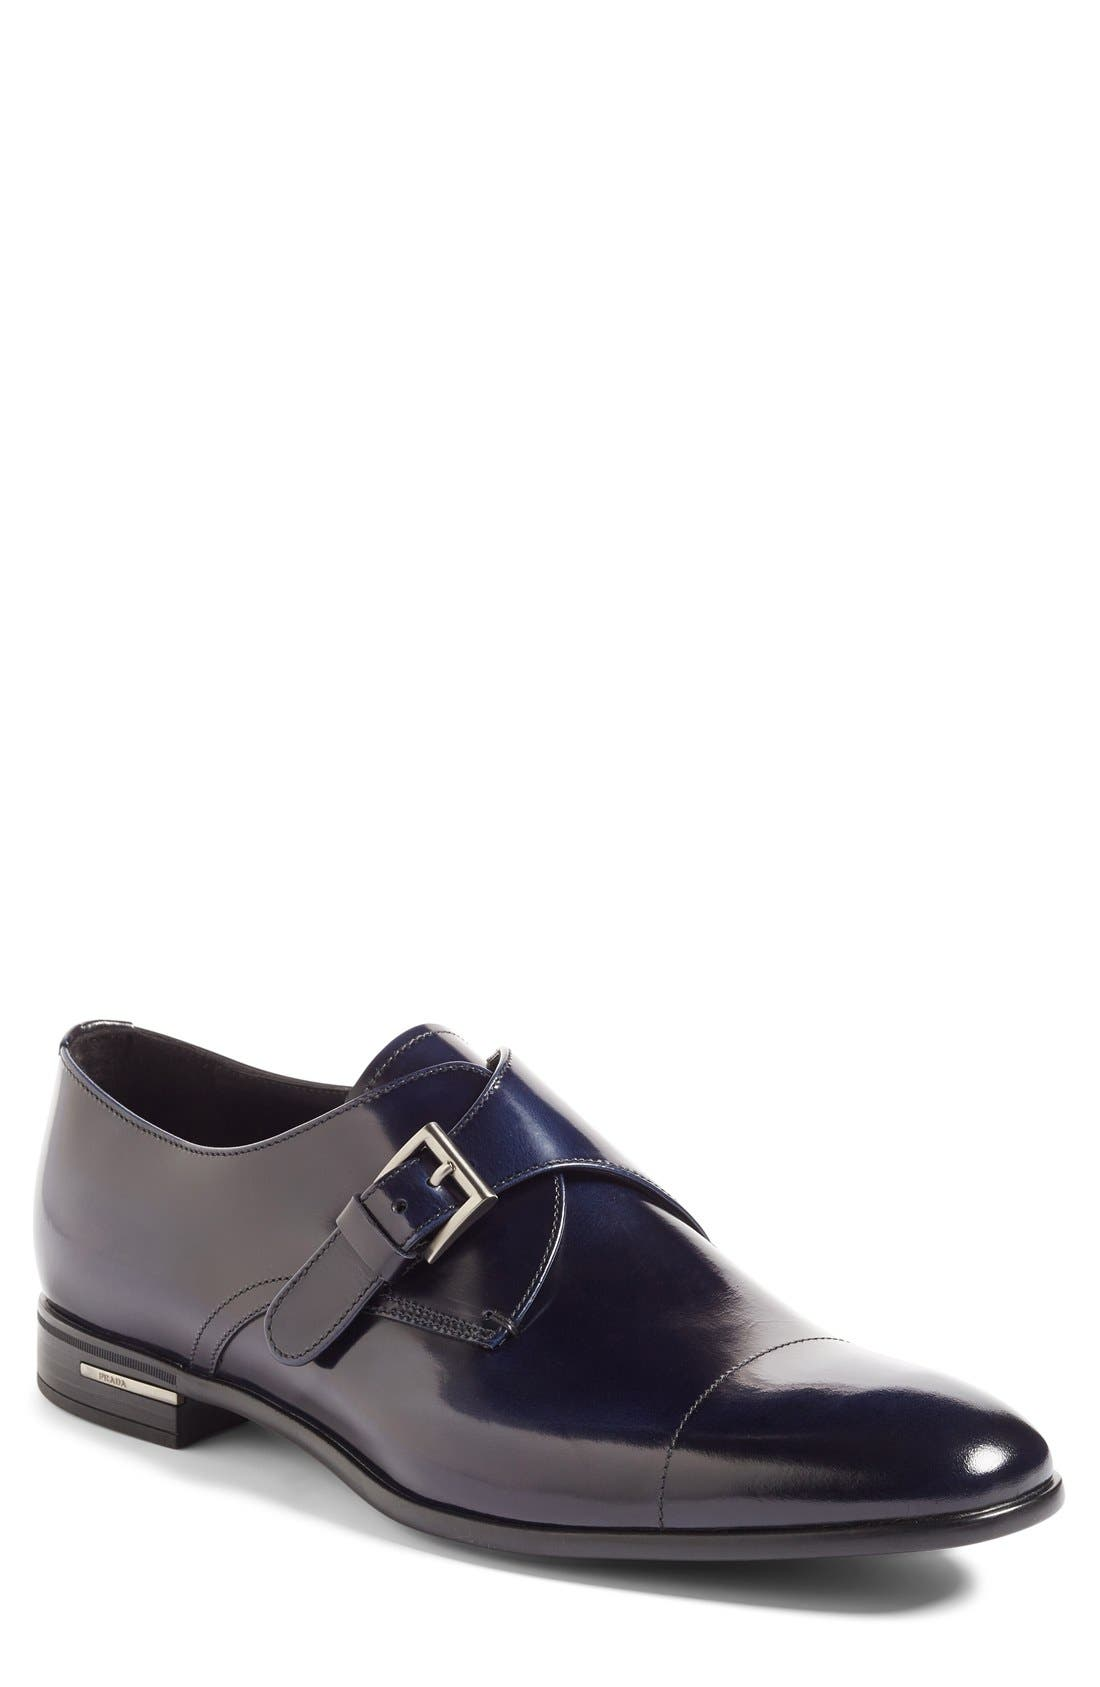 PRADA Monk Strap Shoe, Main, color, BLUE LEATHER